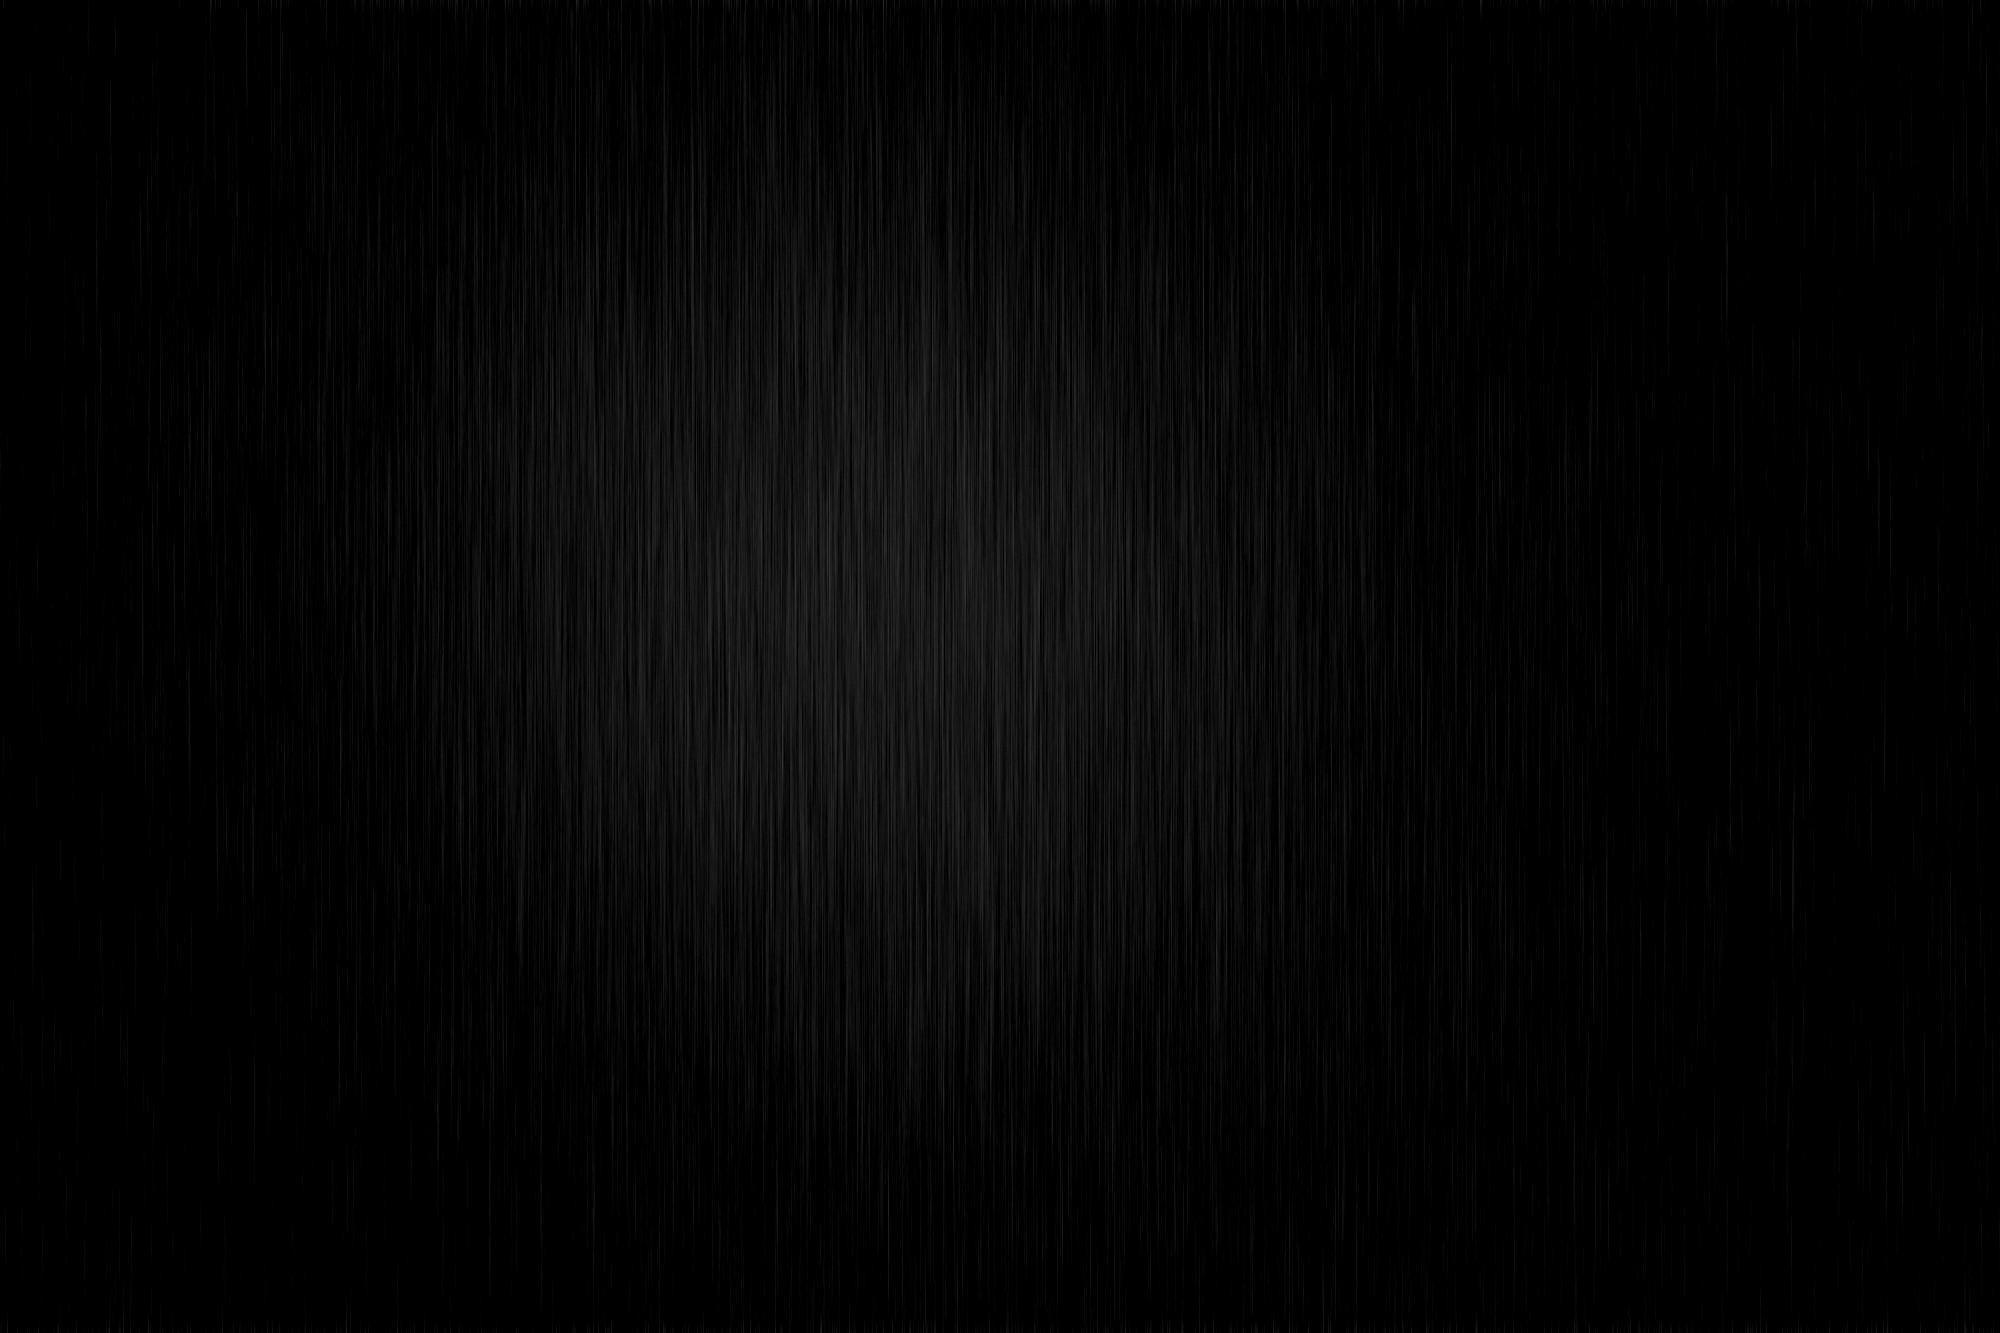 Plain Black Desktop Wallpapers - Wallpaper Cave